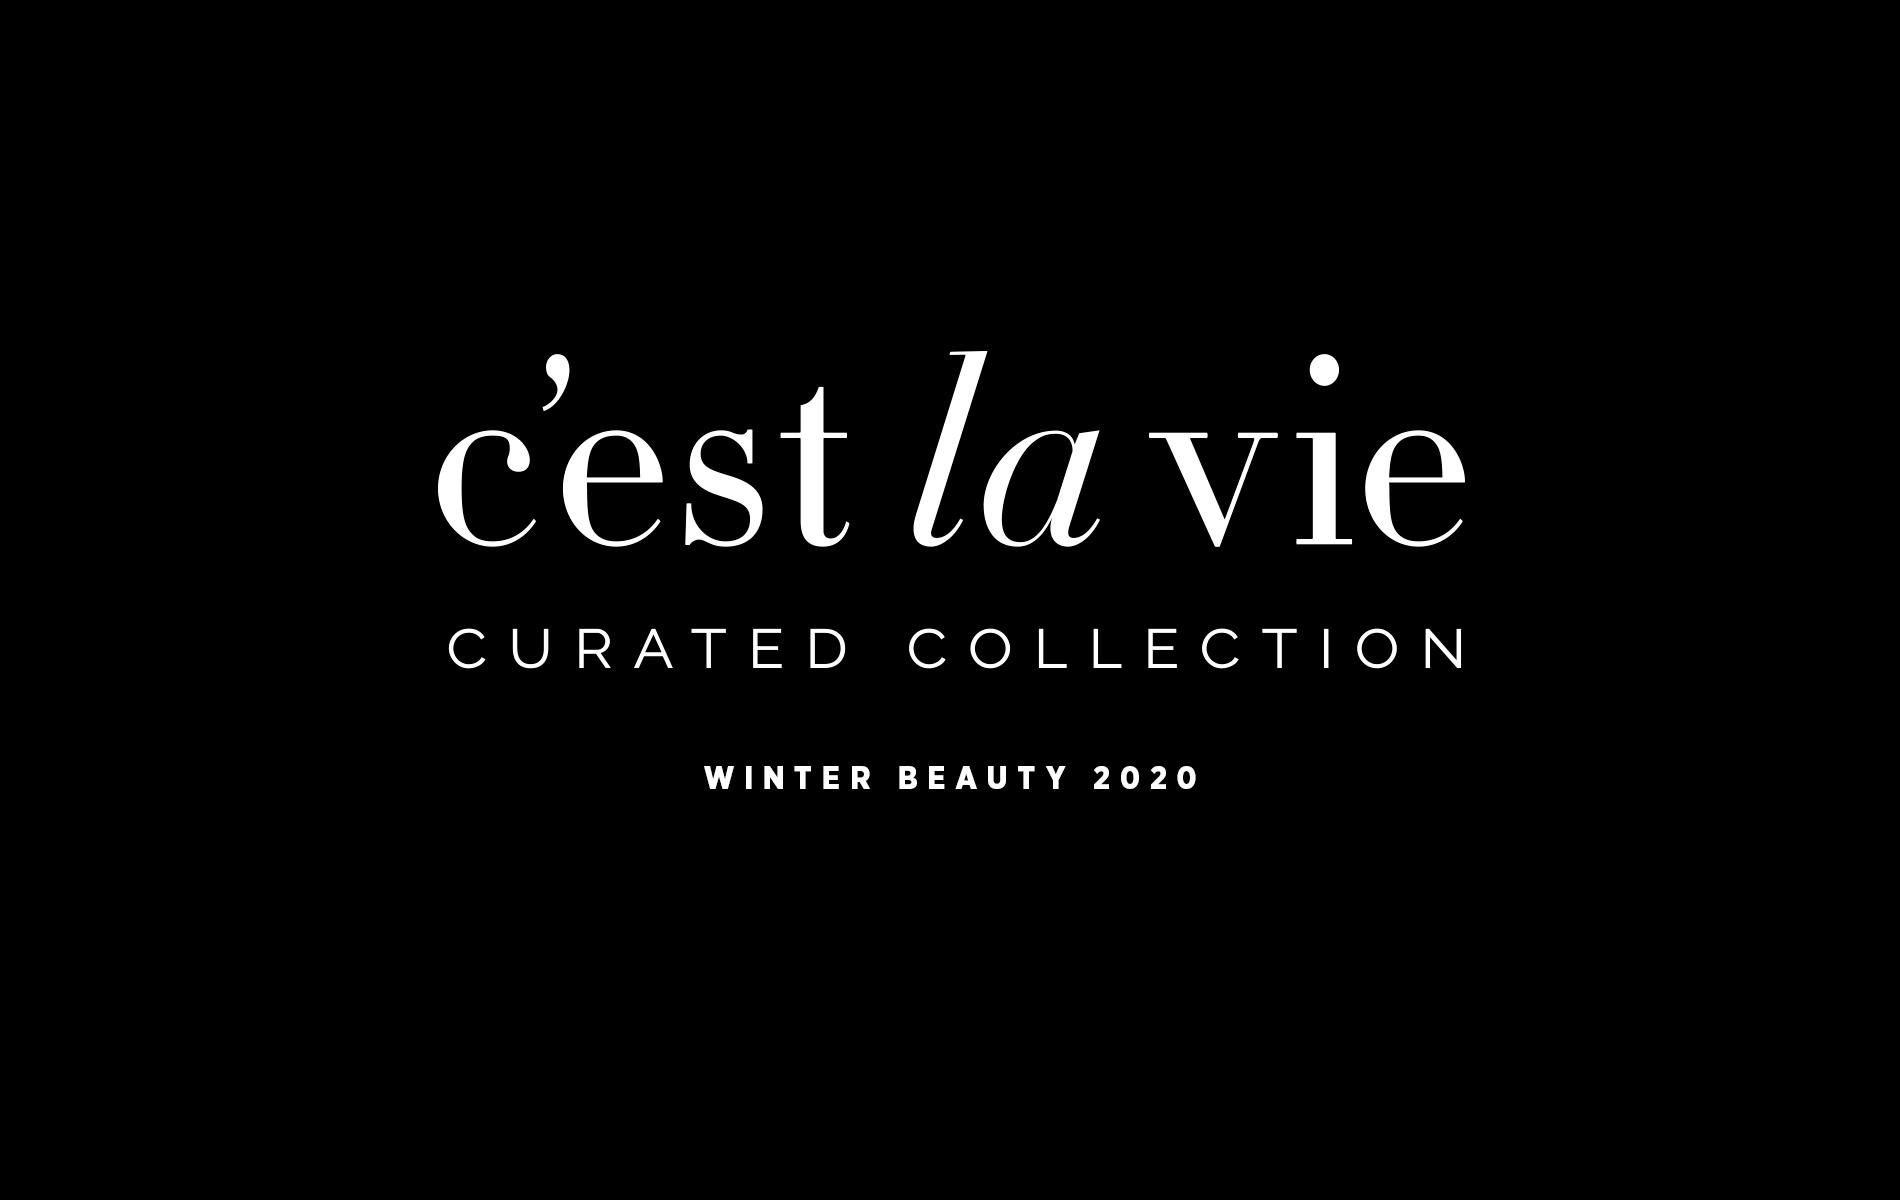 VIE Magazine C'est la VIE Curated Collection Winter Beauty 2020